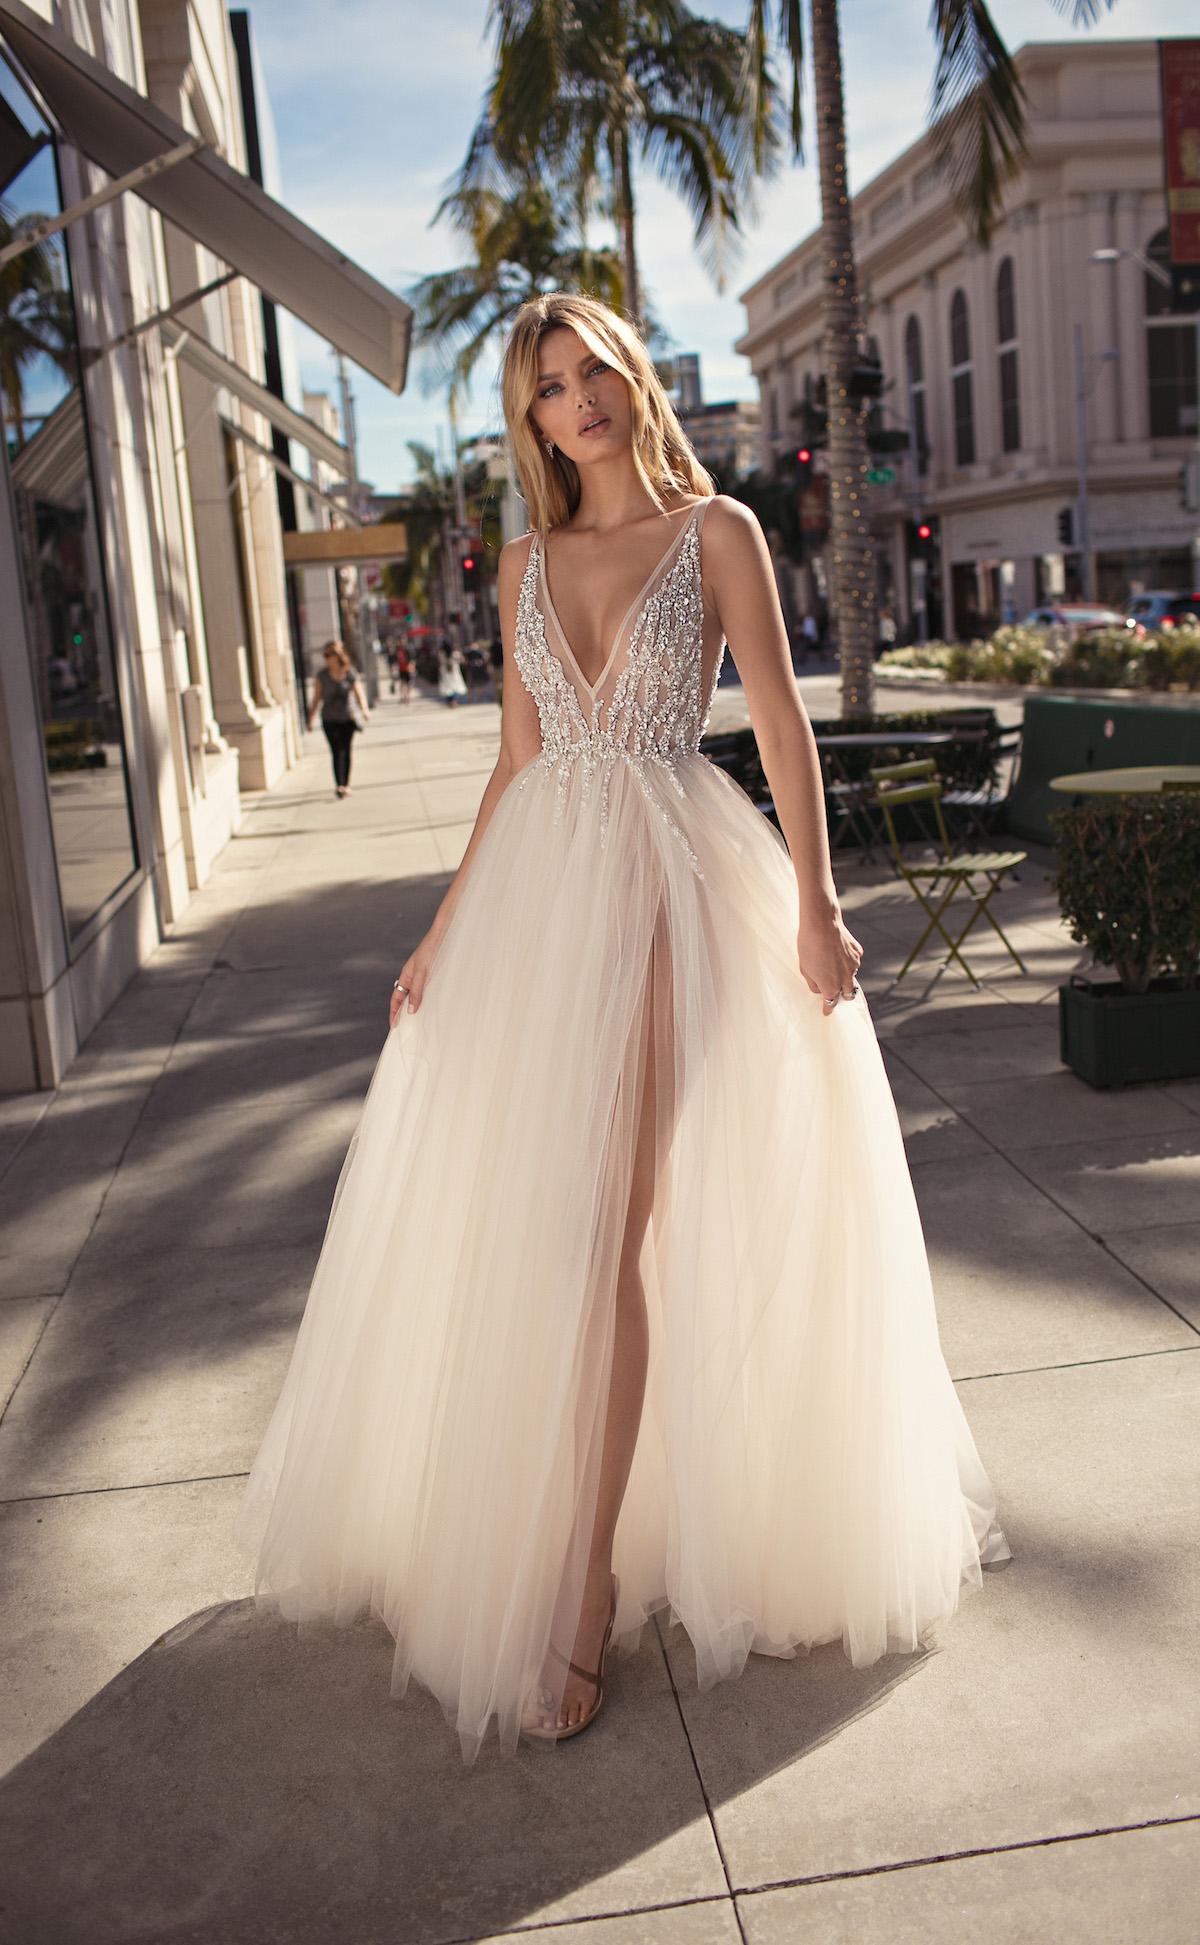 Sheer Perfection BERTAs 2019 City Of Angels Wedding